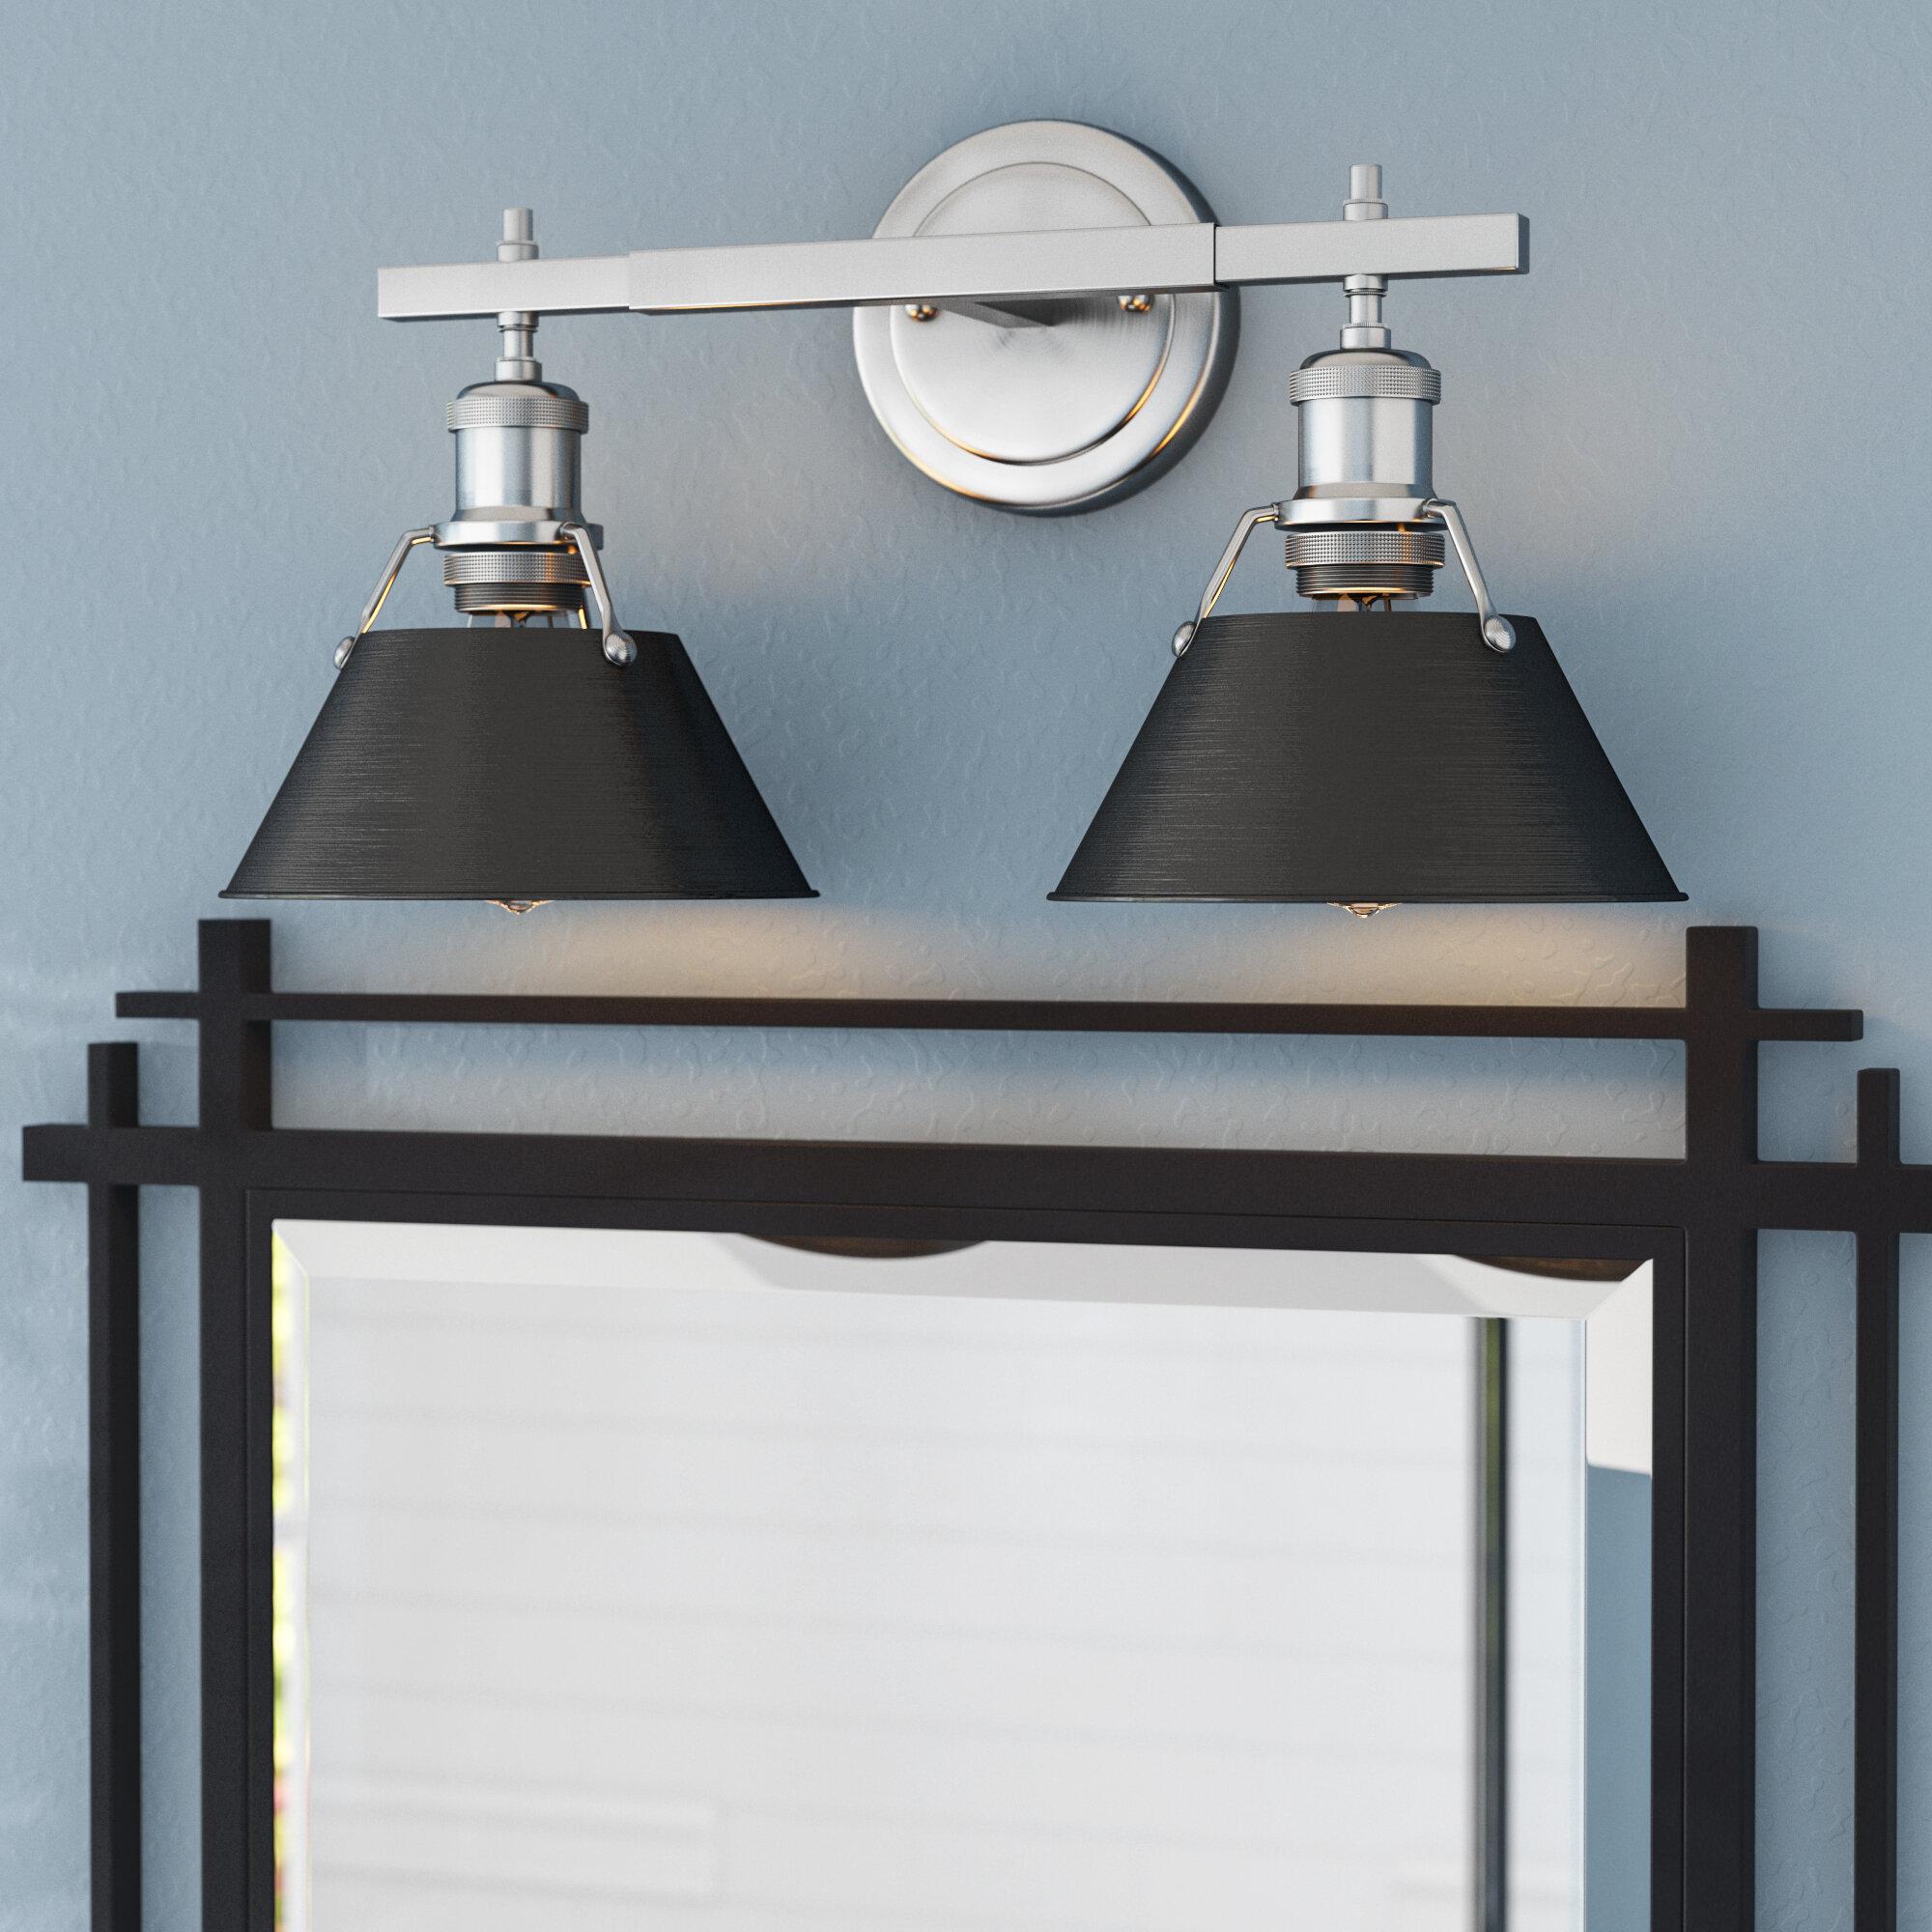 c88f8a16277 Trent Austin Design Weatherford 2-Light Vanity Light   Reviews